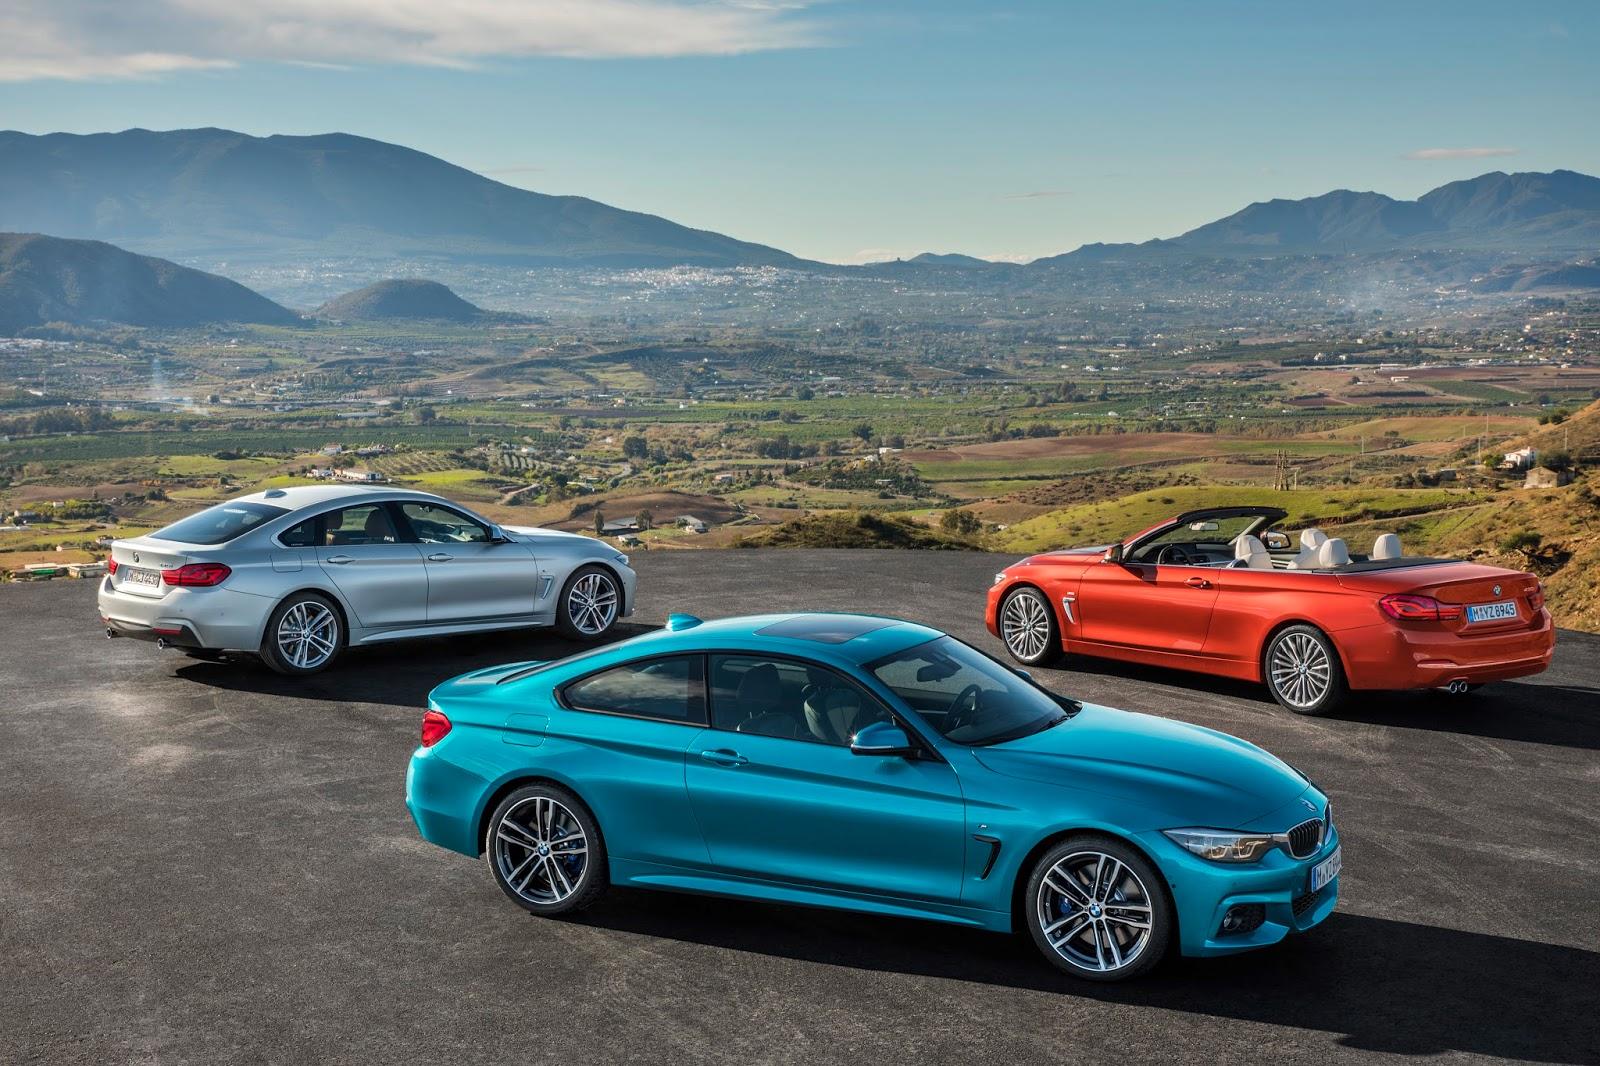 P90245196 highRes the new bmw 4 series Η νέα BMW Σειρά 4, με πιο σφιχτή ρύθμιση ανάρτησης BMW, Bmw 4, BMW 4 Cabrio, BMW 4 Coupe, BMW 4 Gran Coupé, Facelift